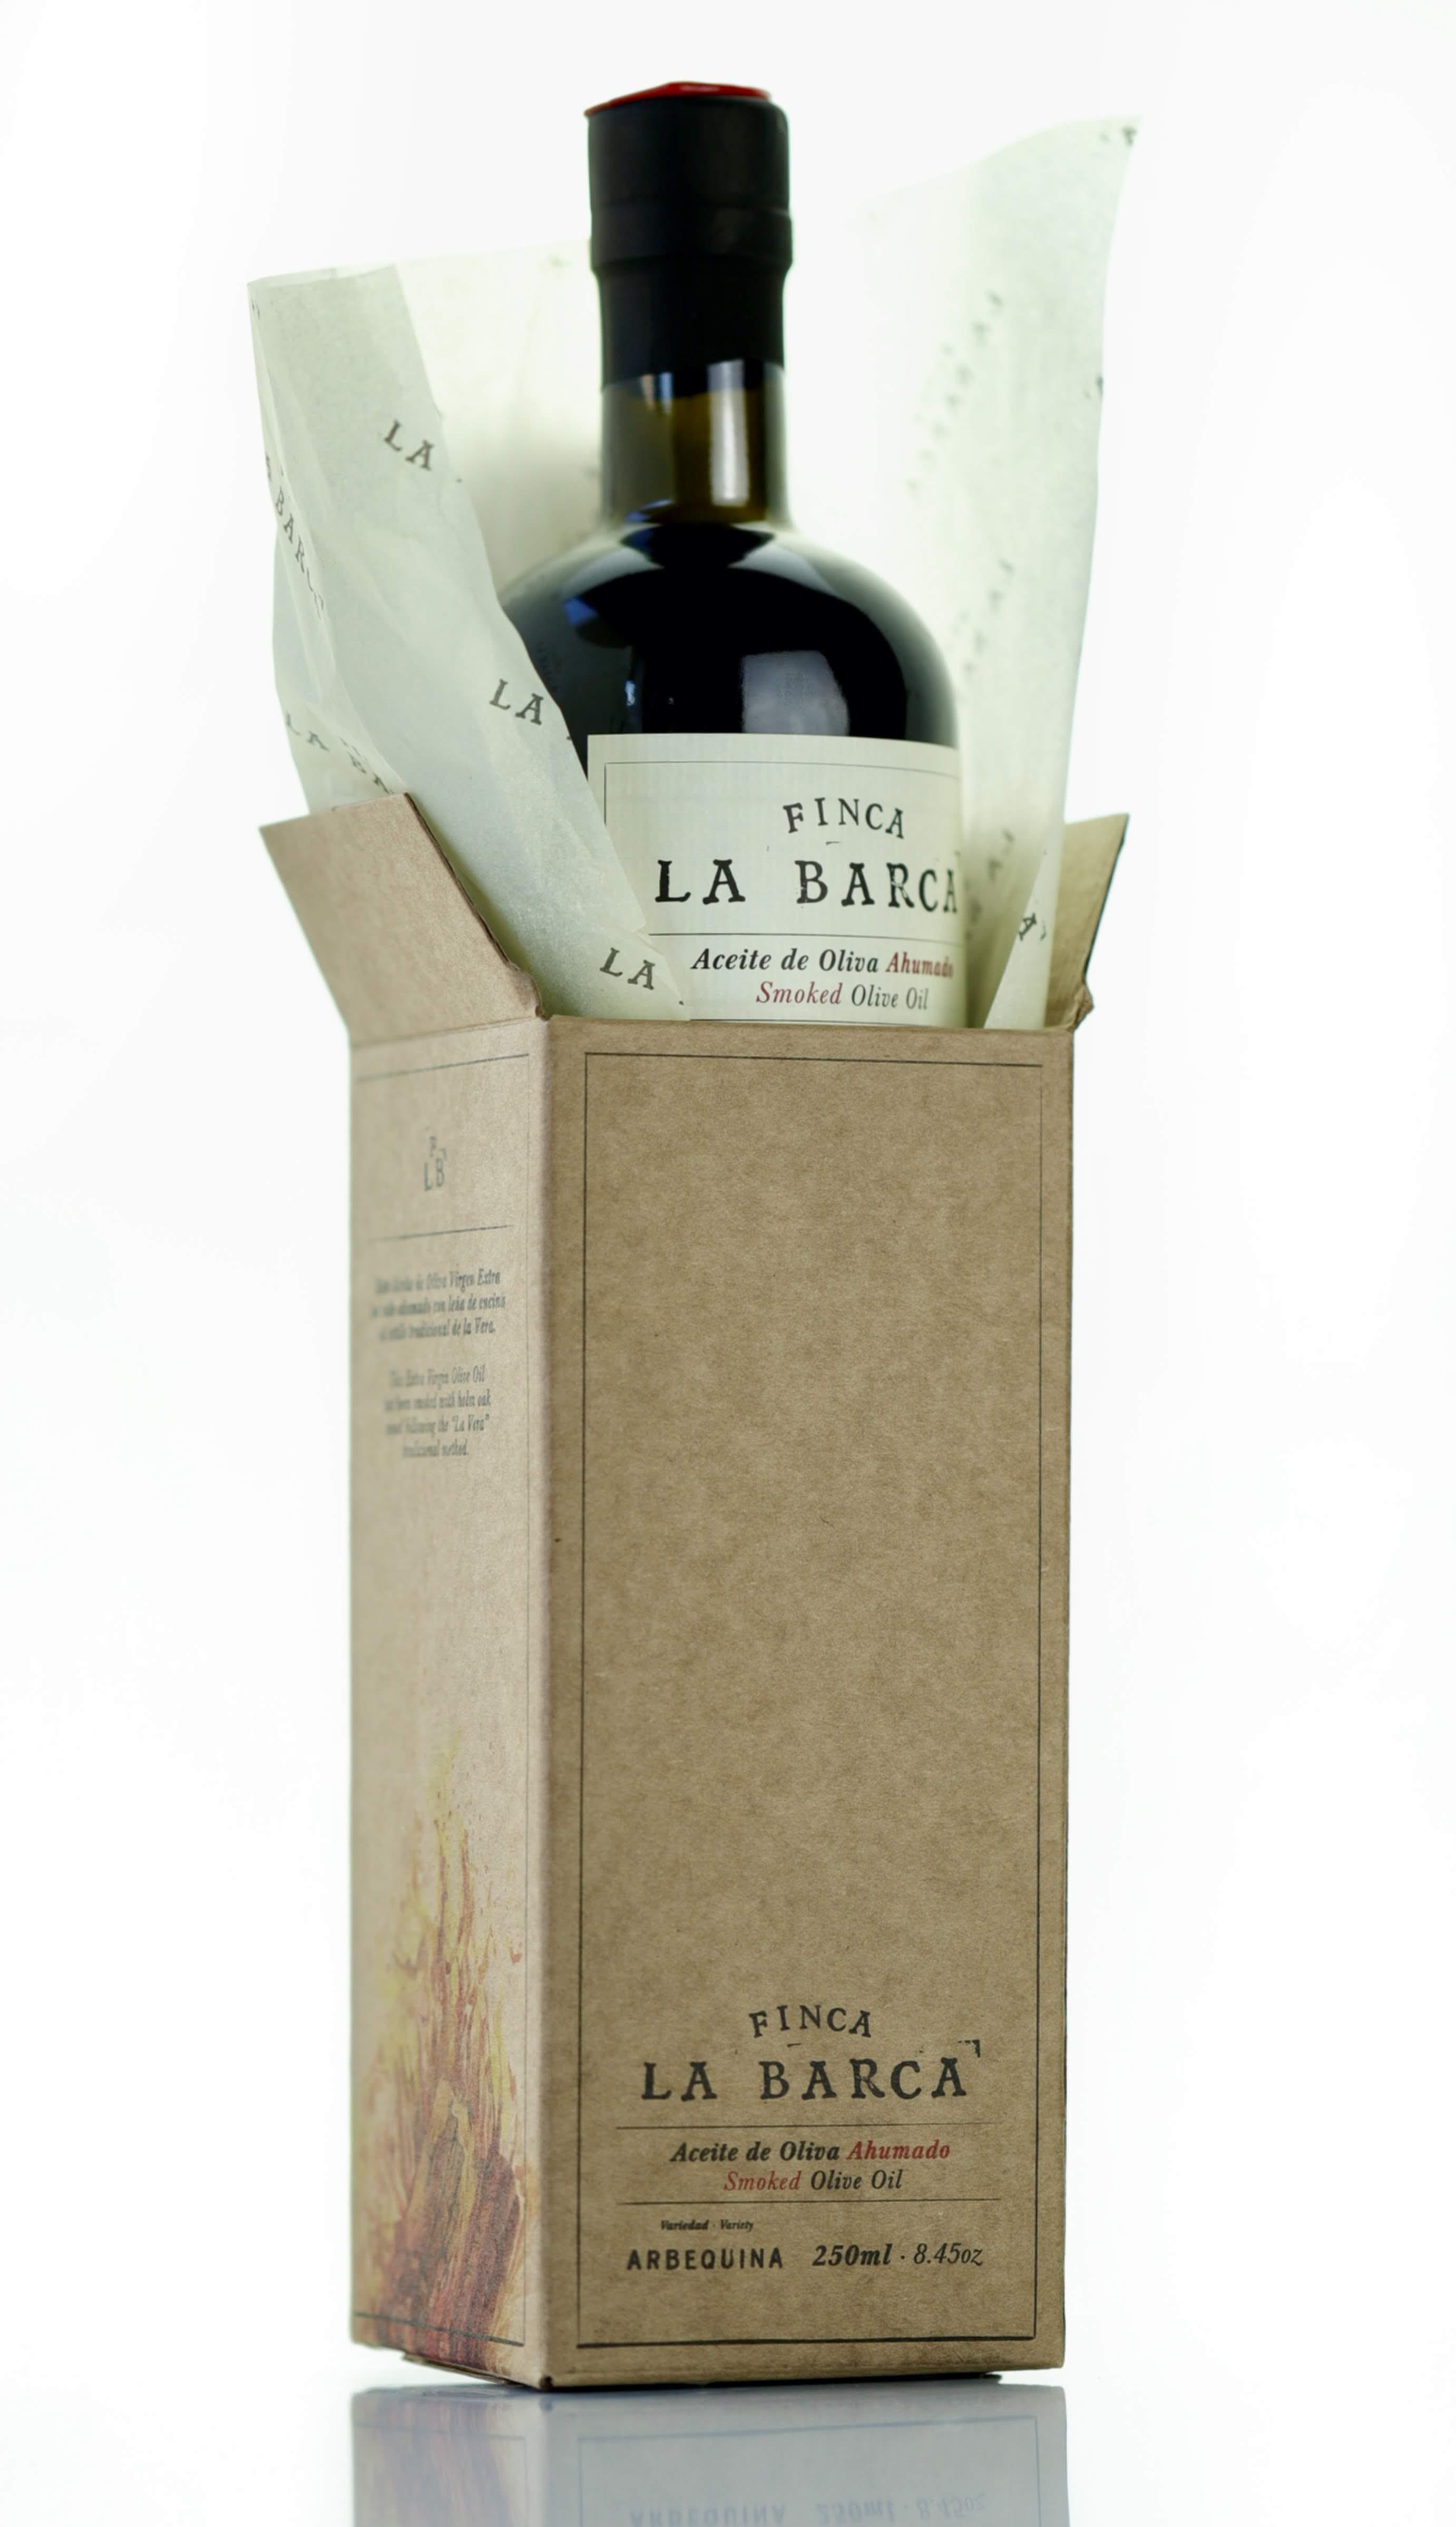 "Aceite de Oliva Ahumado ""Finca La Barca"" botella 250 ml. - Caja Regalo"